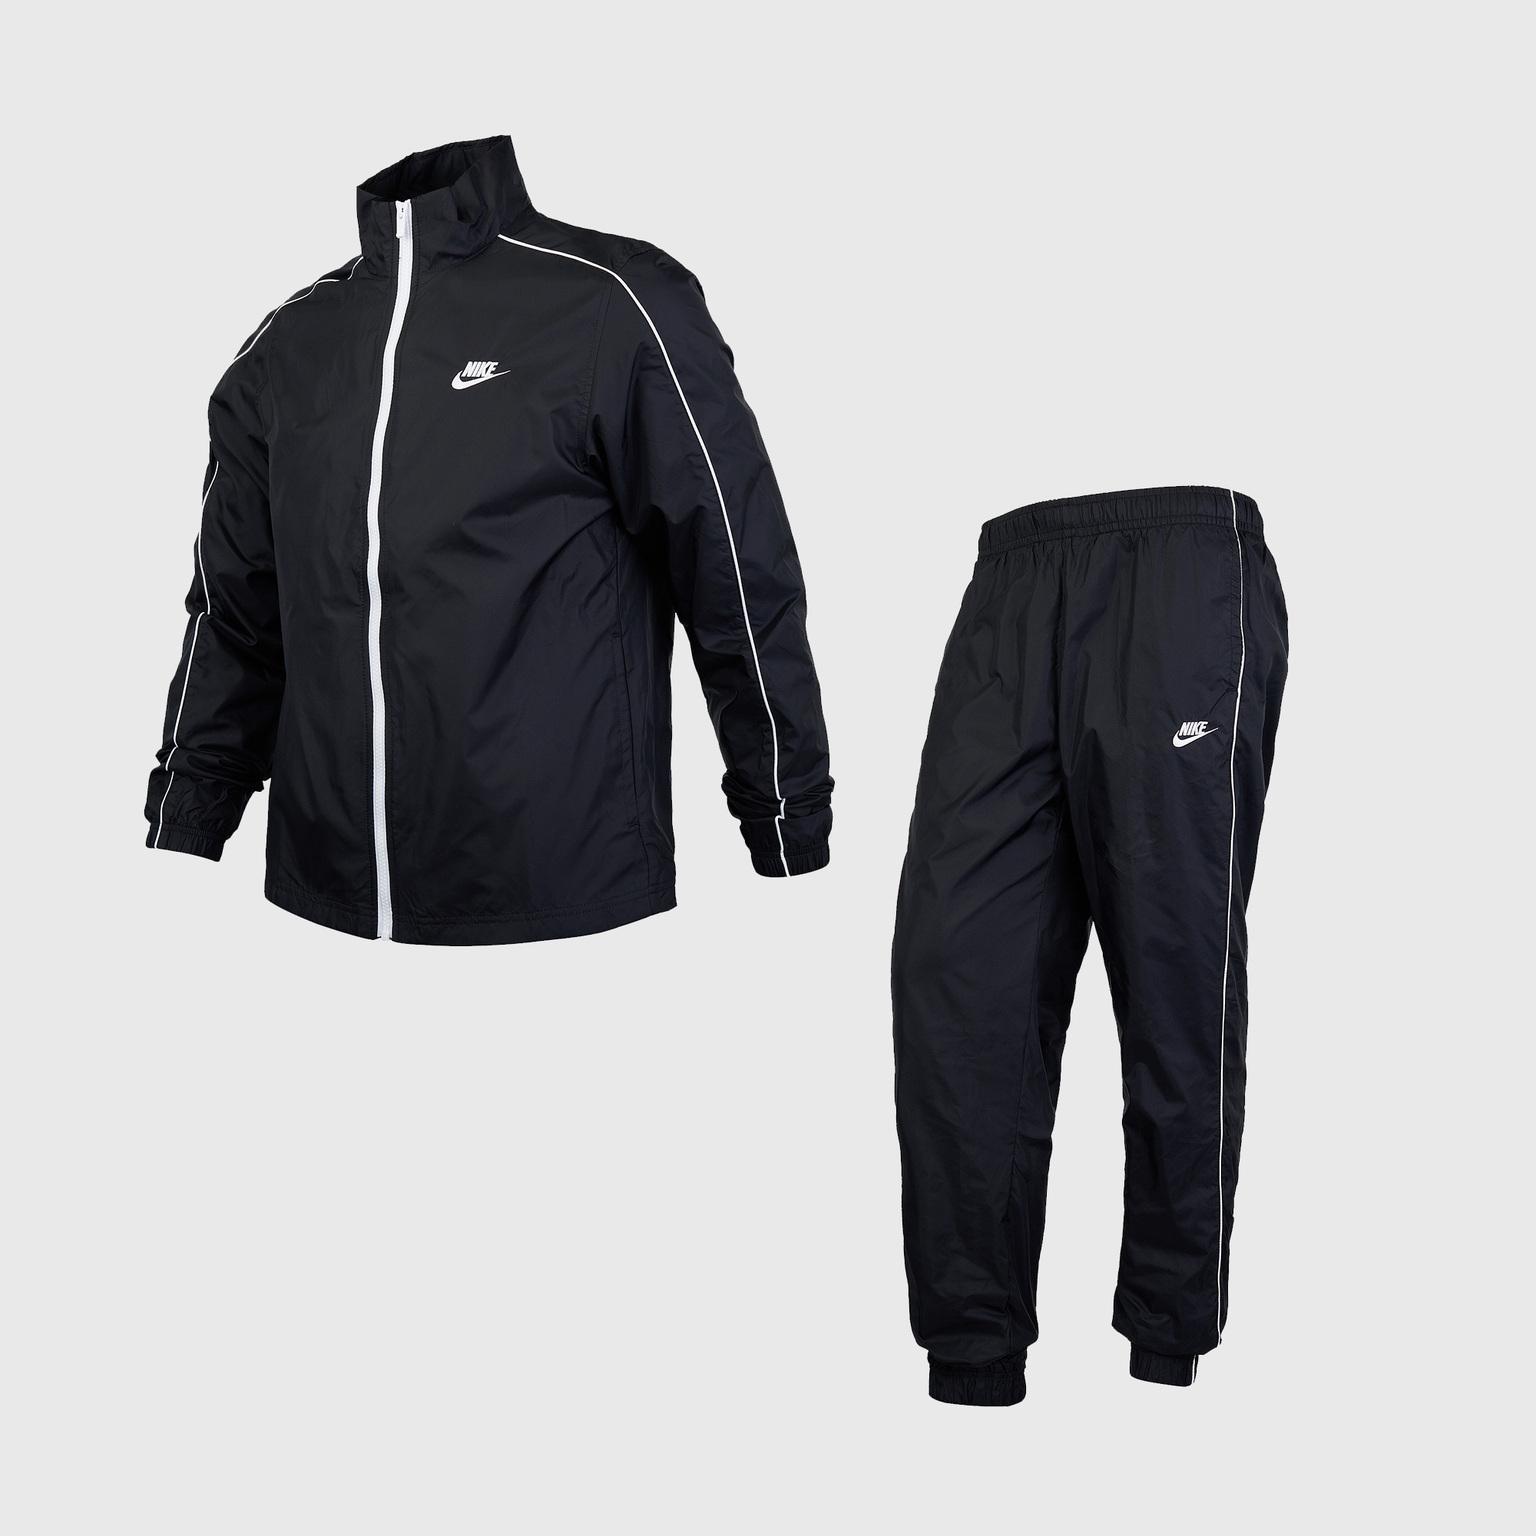 Костюм спортивный Nike Sportswear Woven Suit Basic BV3030-010